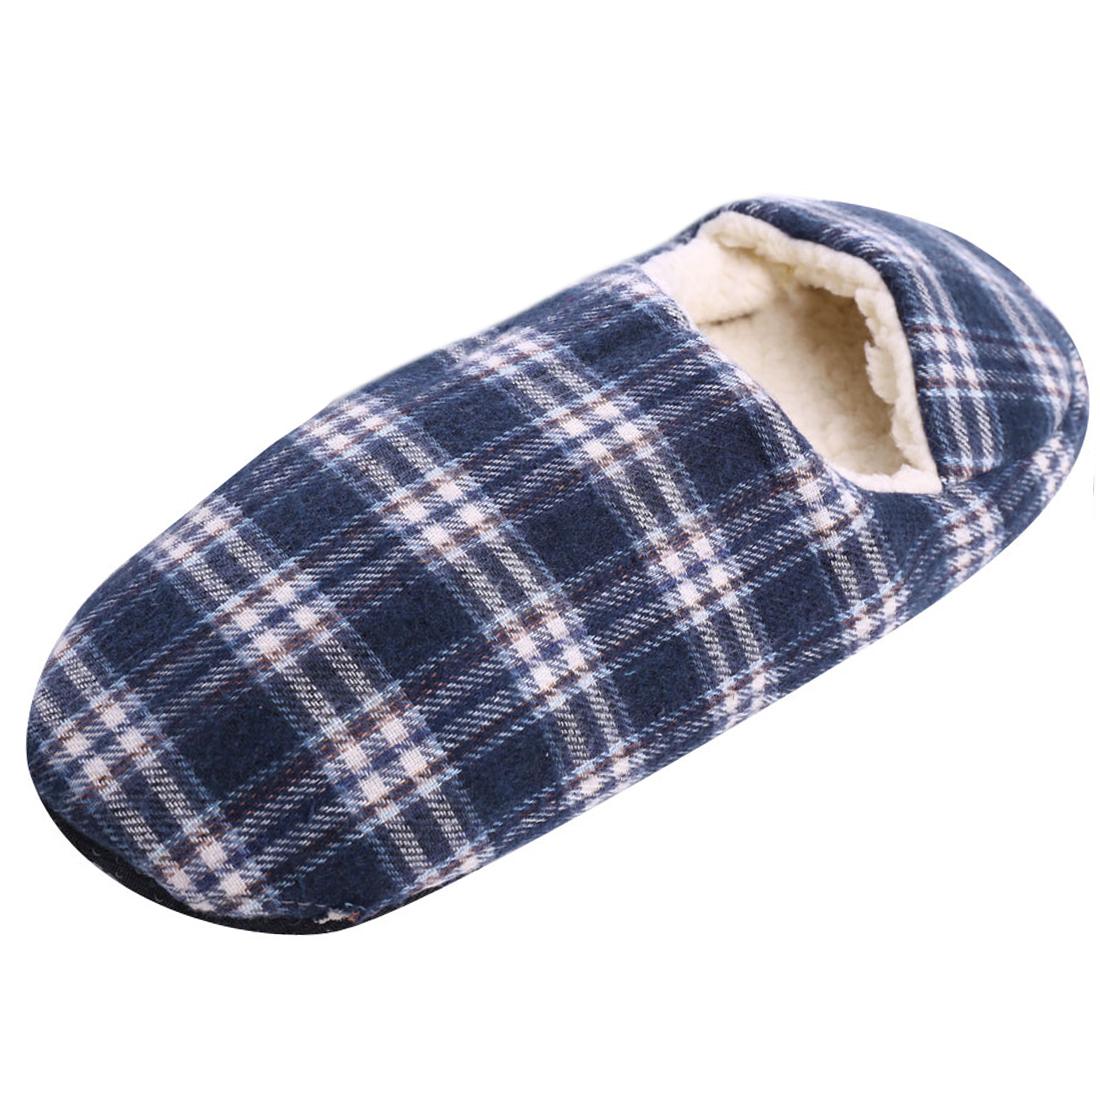 Men Plaids Upper Round Toe Color Block Fashion NEW Slippers Blue White US 8